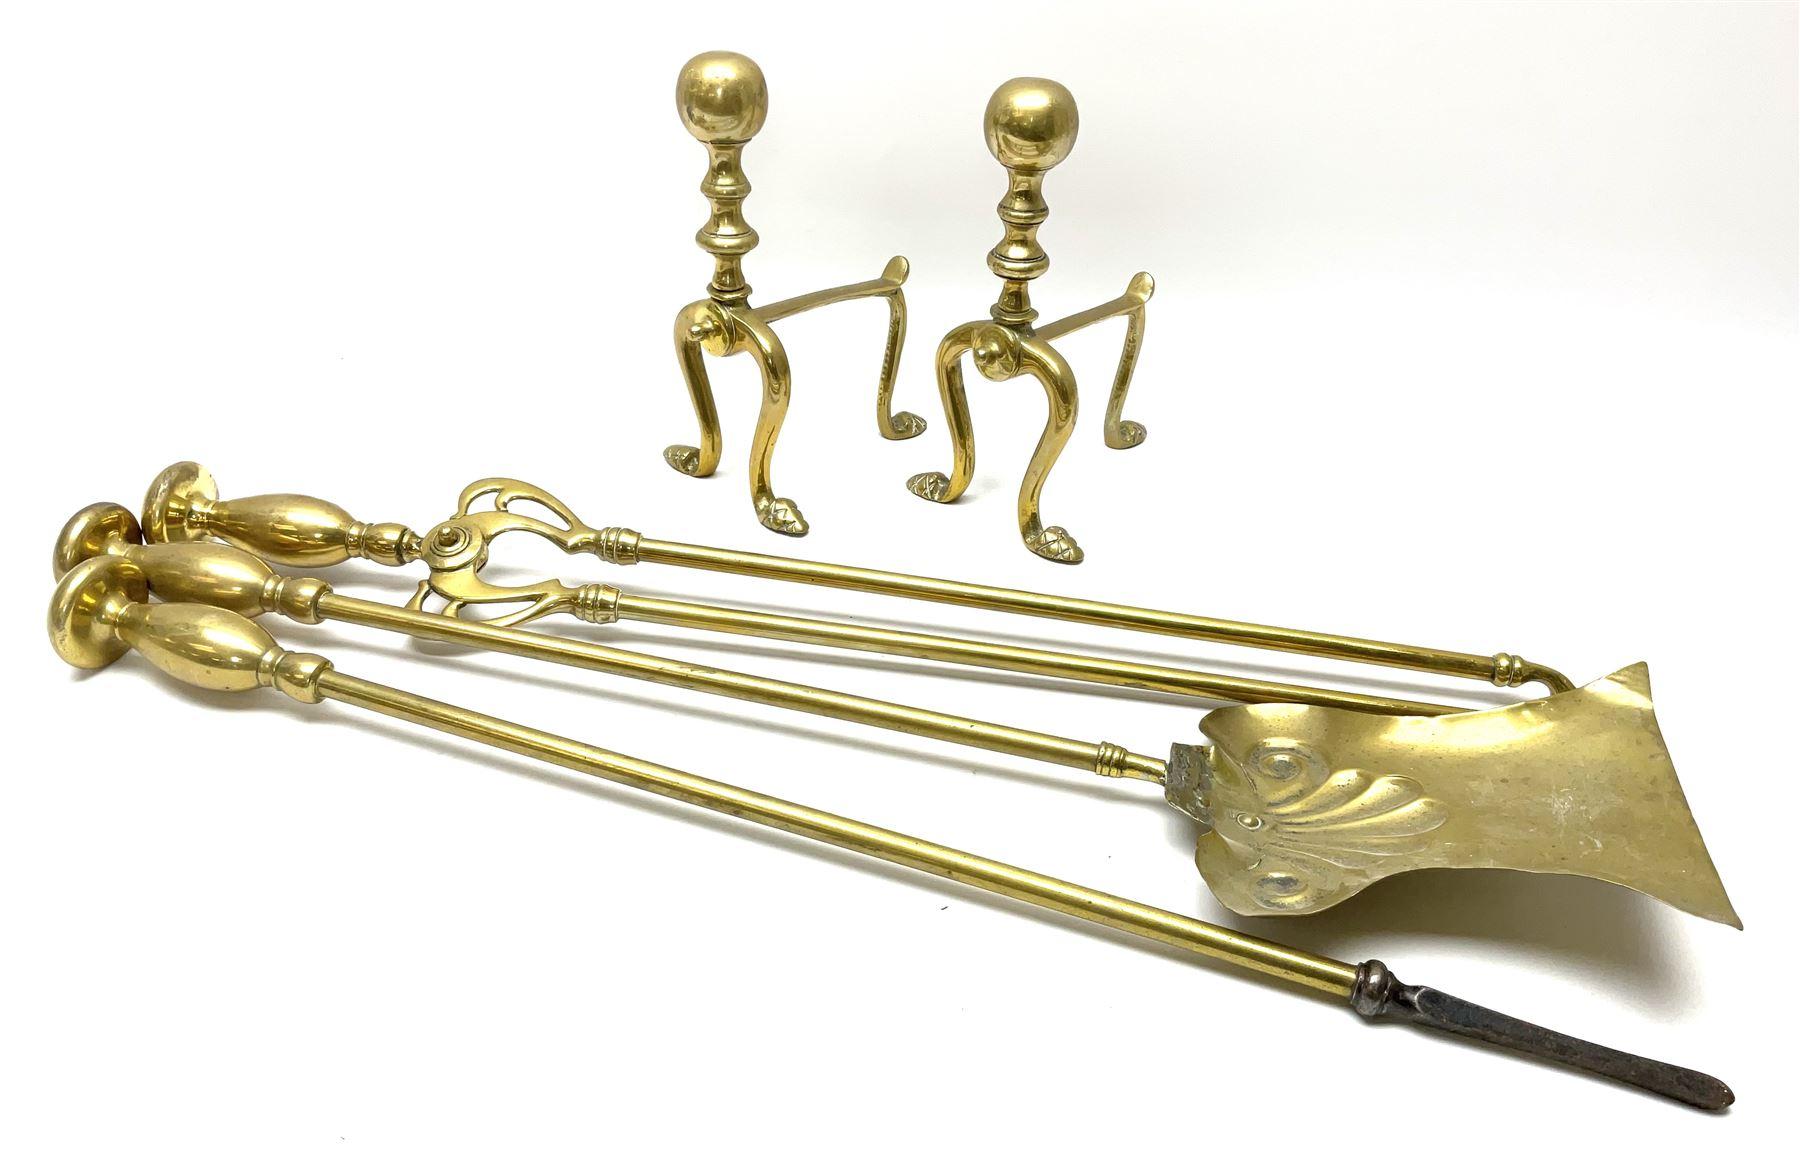 Set of three brass long-handled fire tools